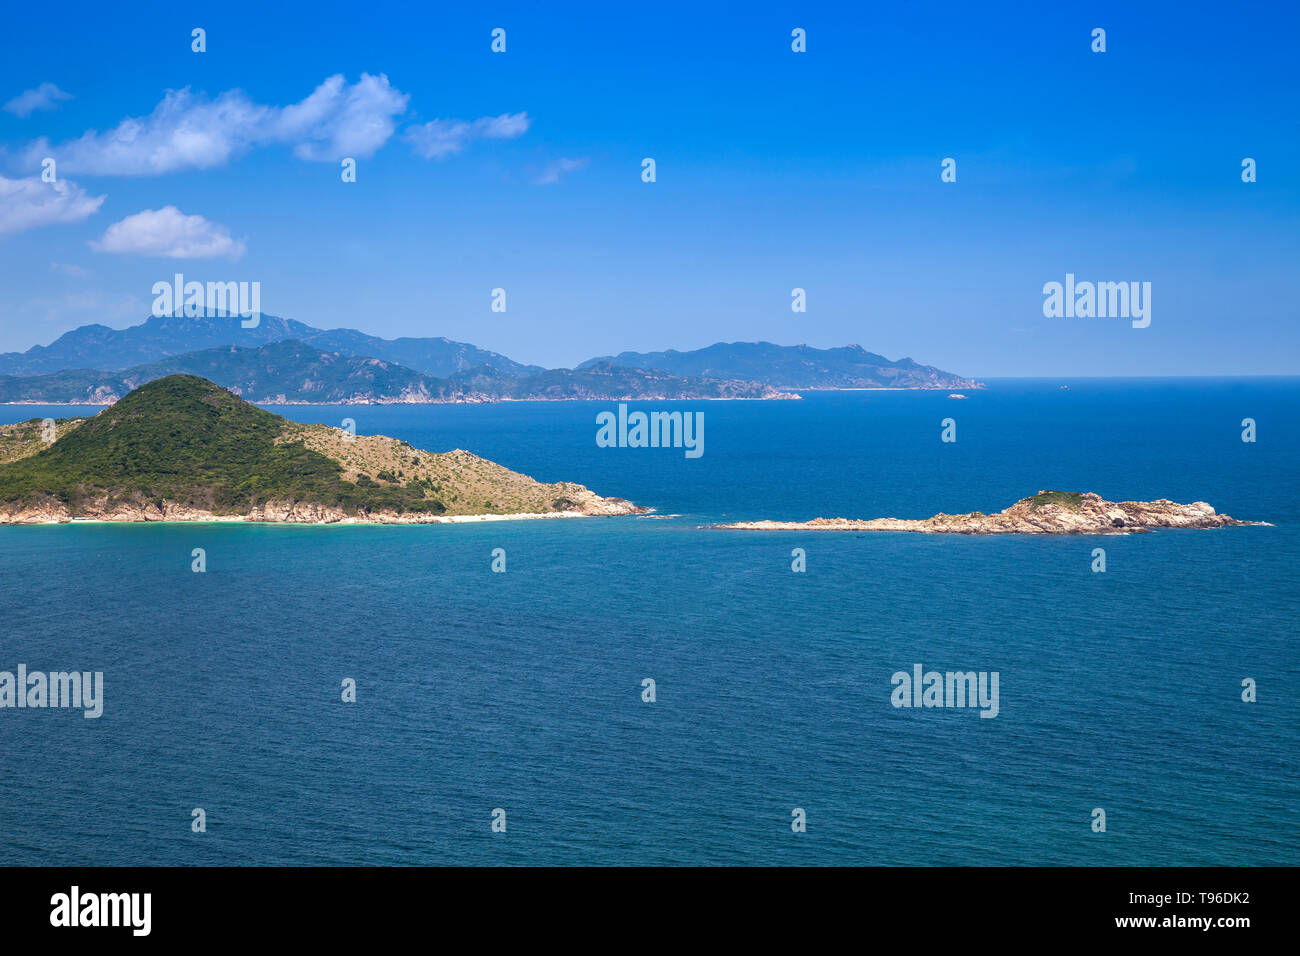 Rocky coast landscape at Vinh Hy, South China Sea,Ninh Thuan, Vietnam - Stock Image